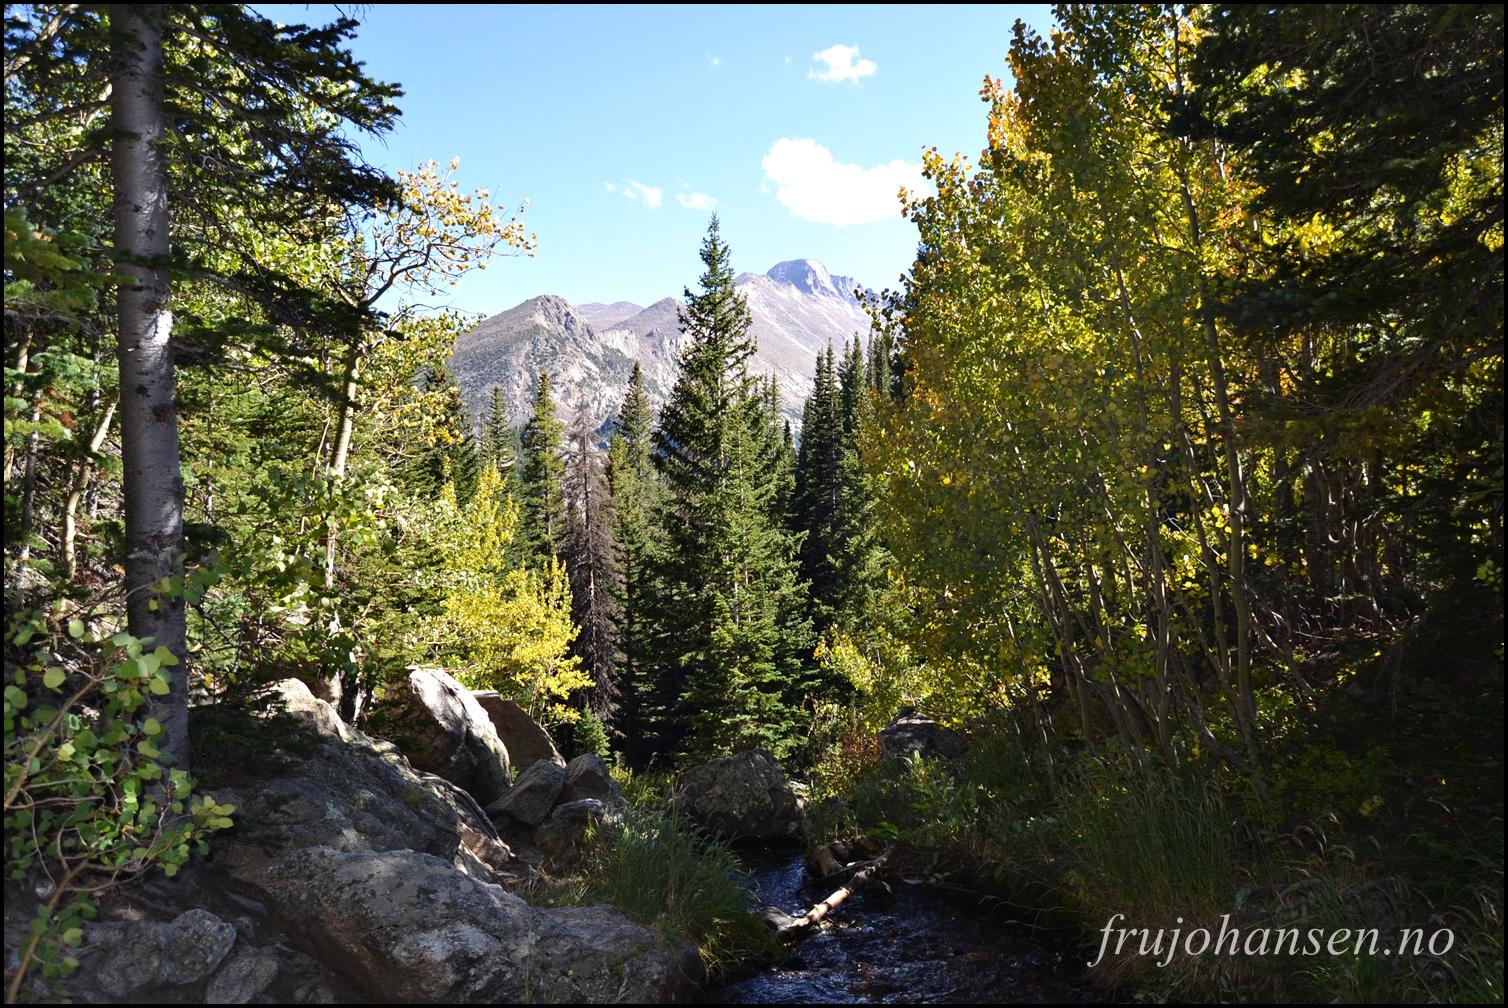 Opplev Rocky Mountains